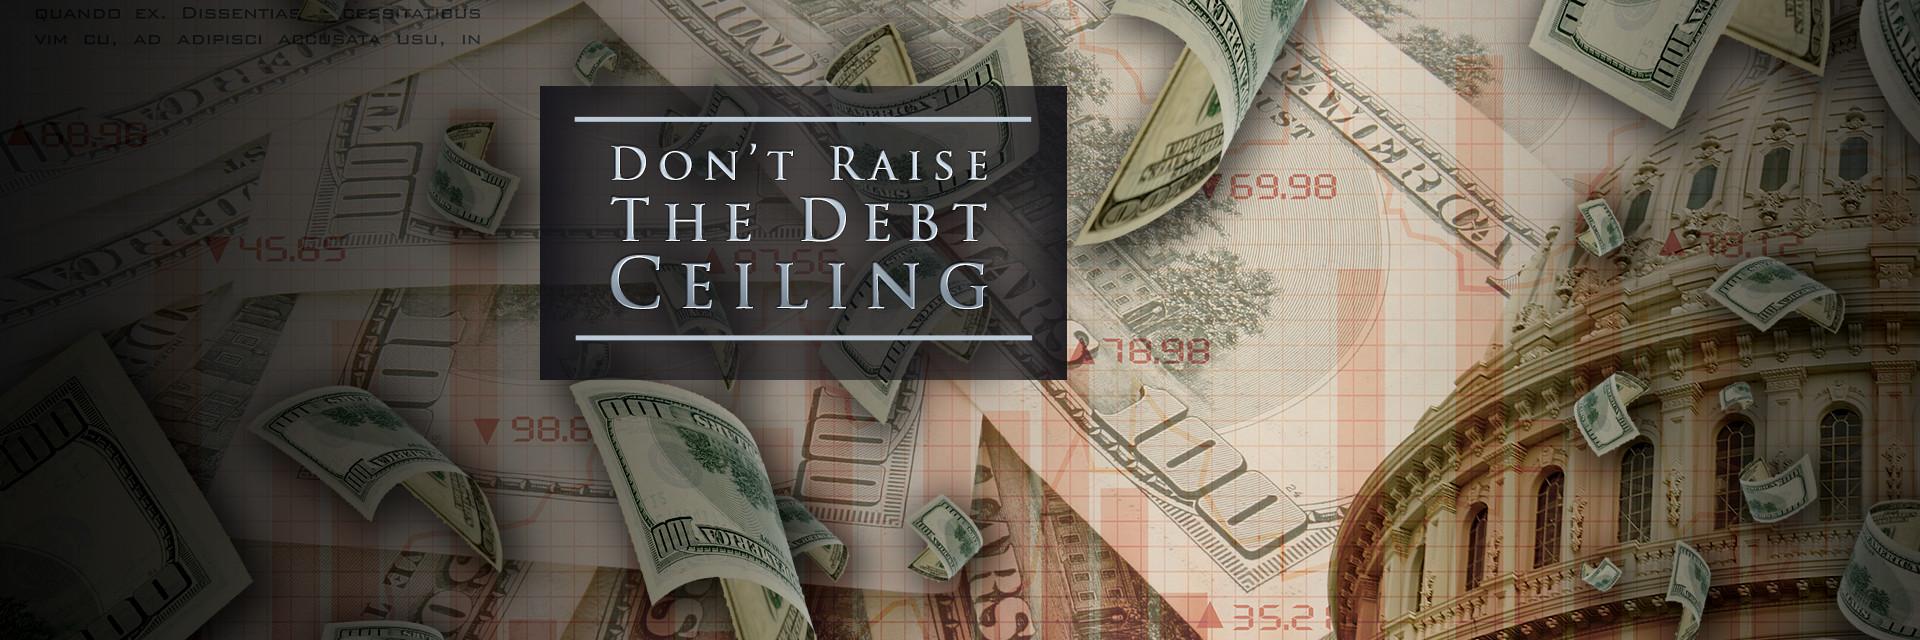 Debt-Ceiling-No-Petition-Slider